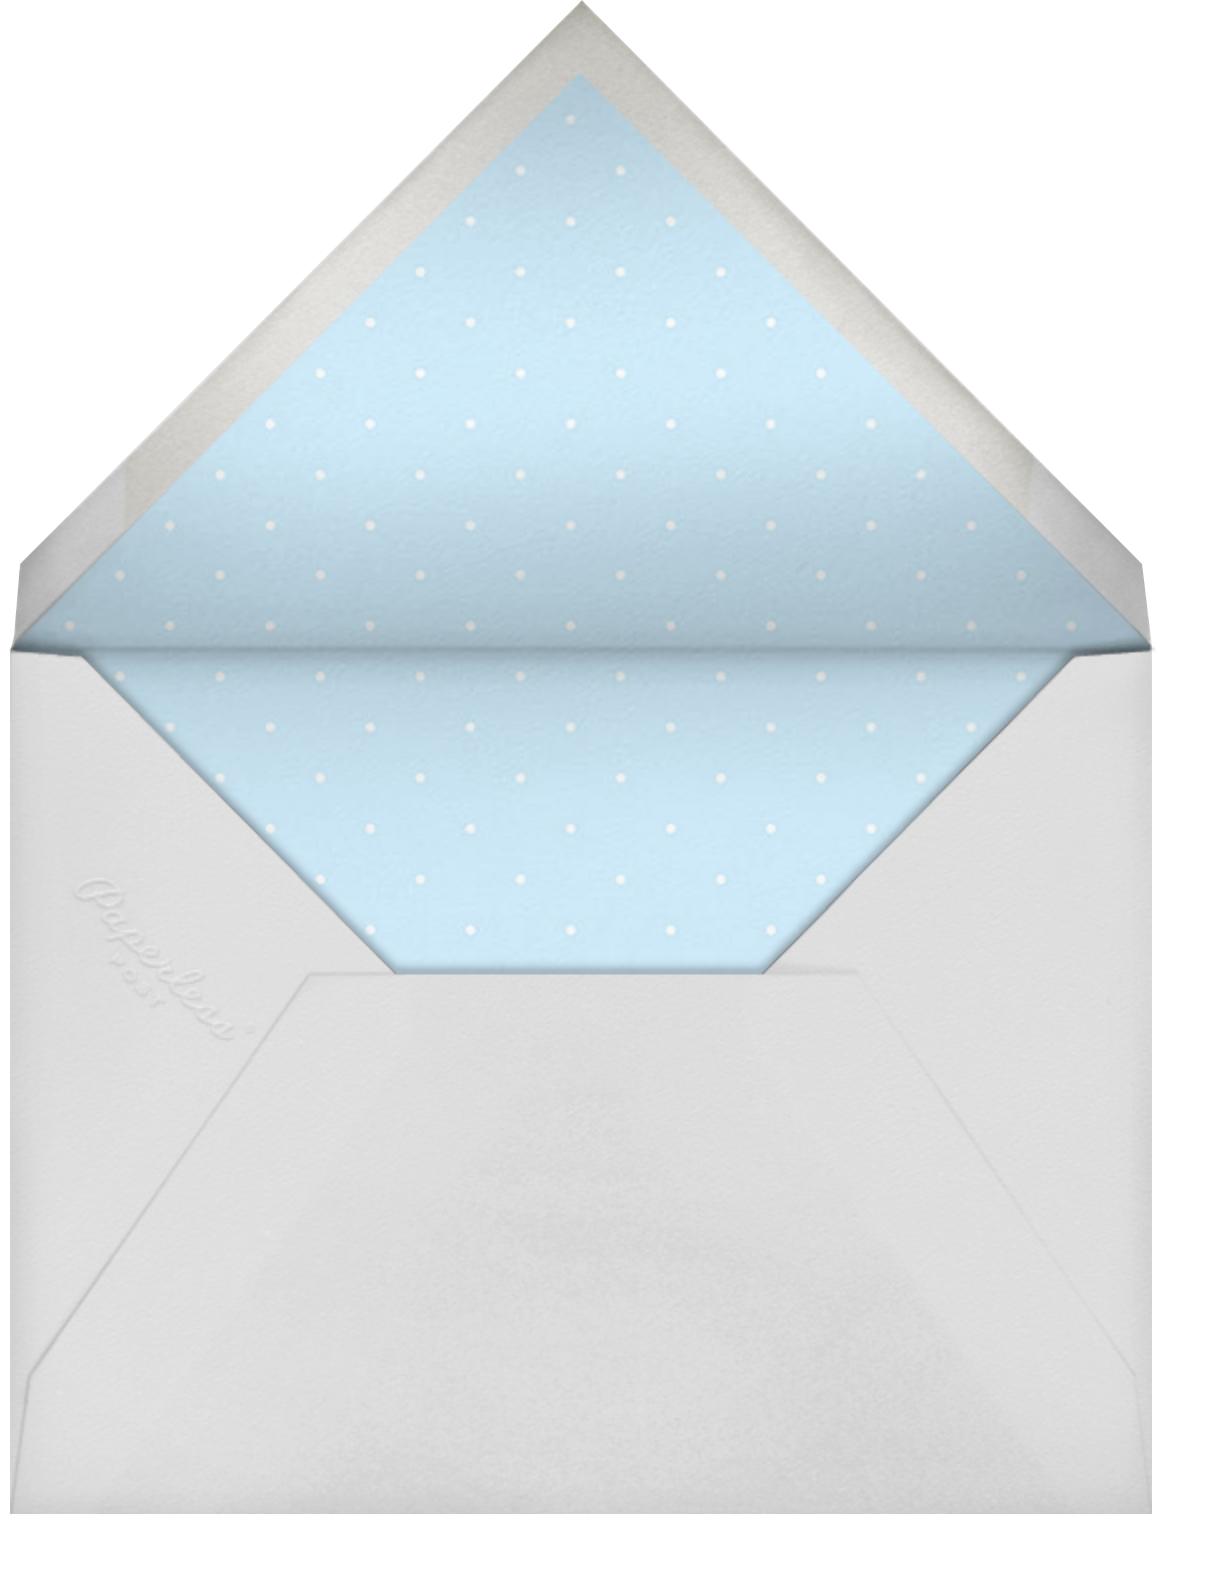 San Francisco Skyline Snowglobe - Paperless Post - Winter parties - envelope back